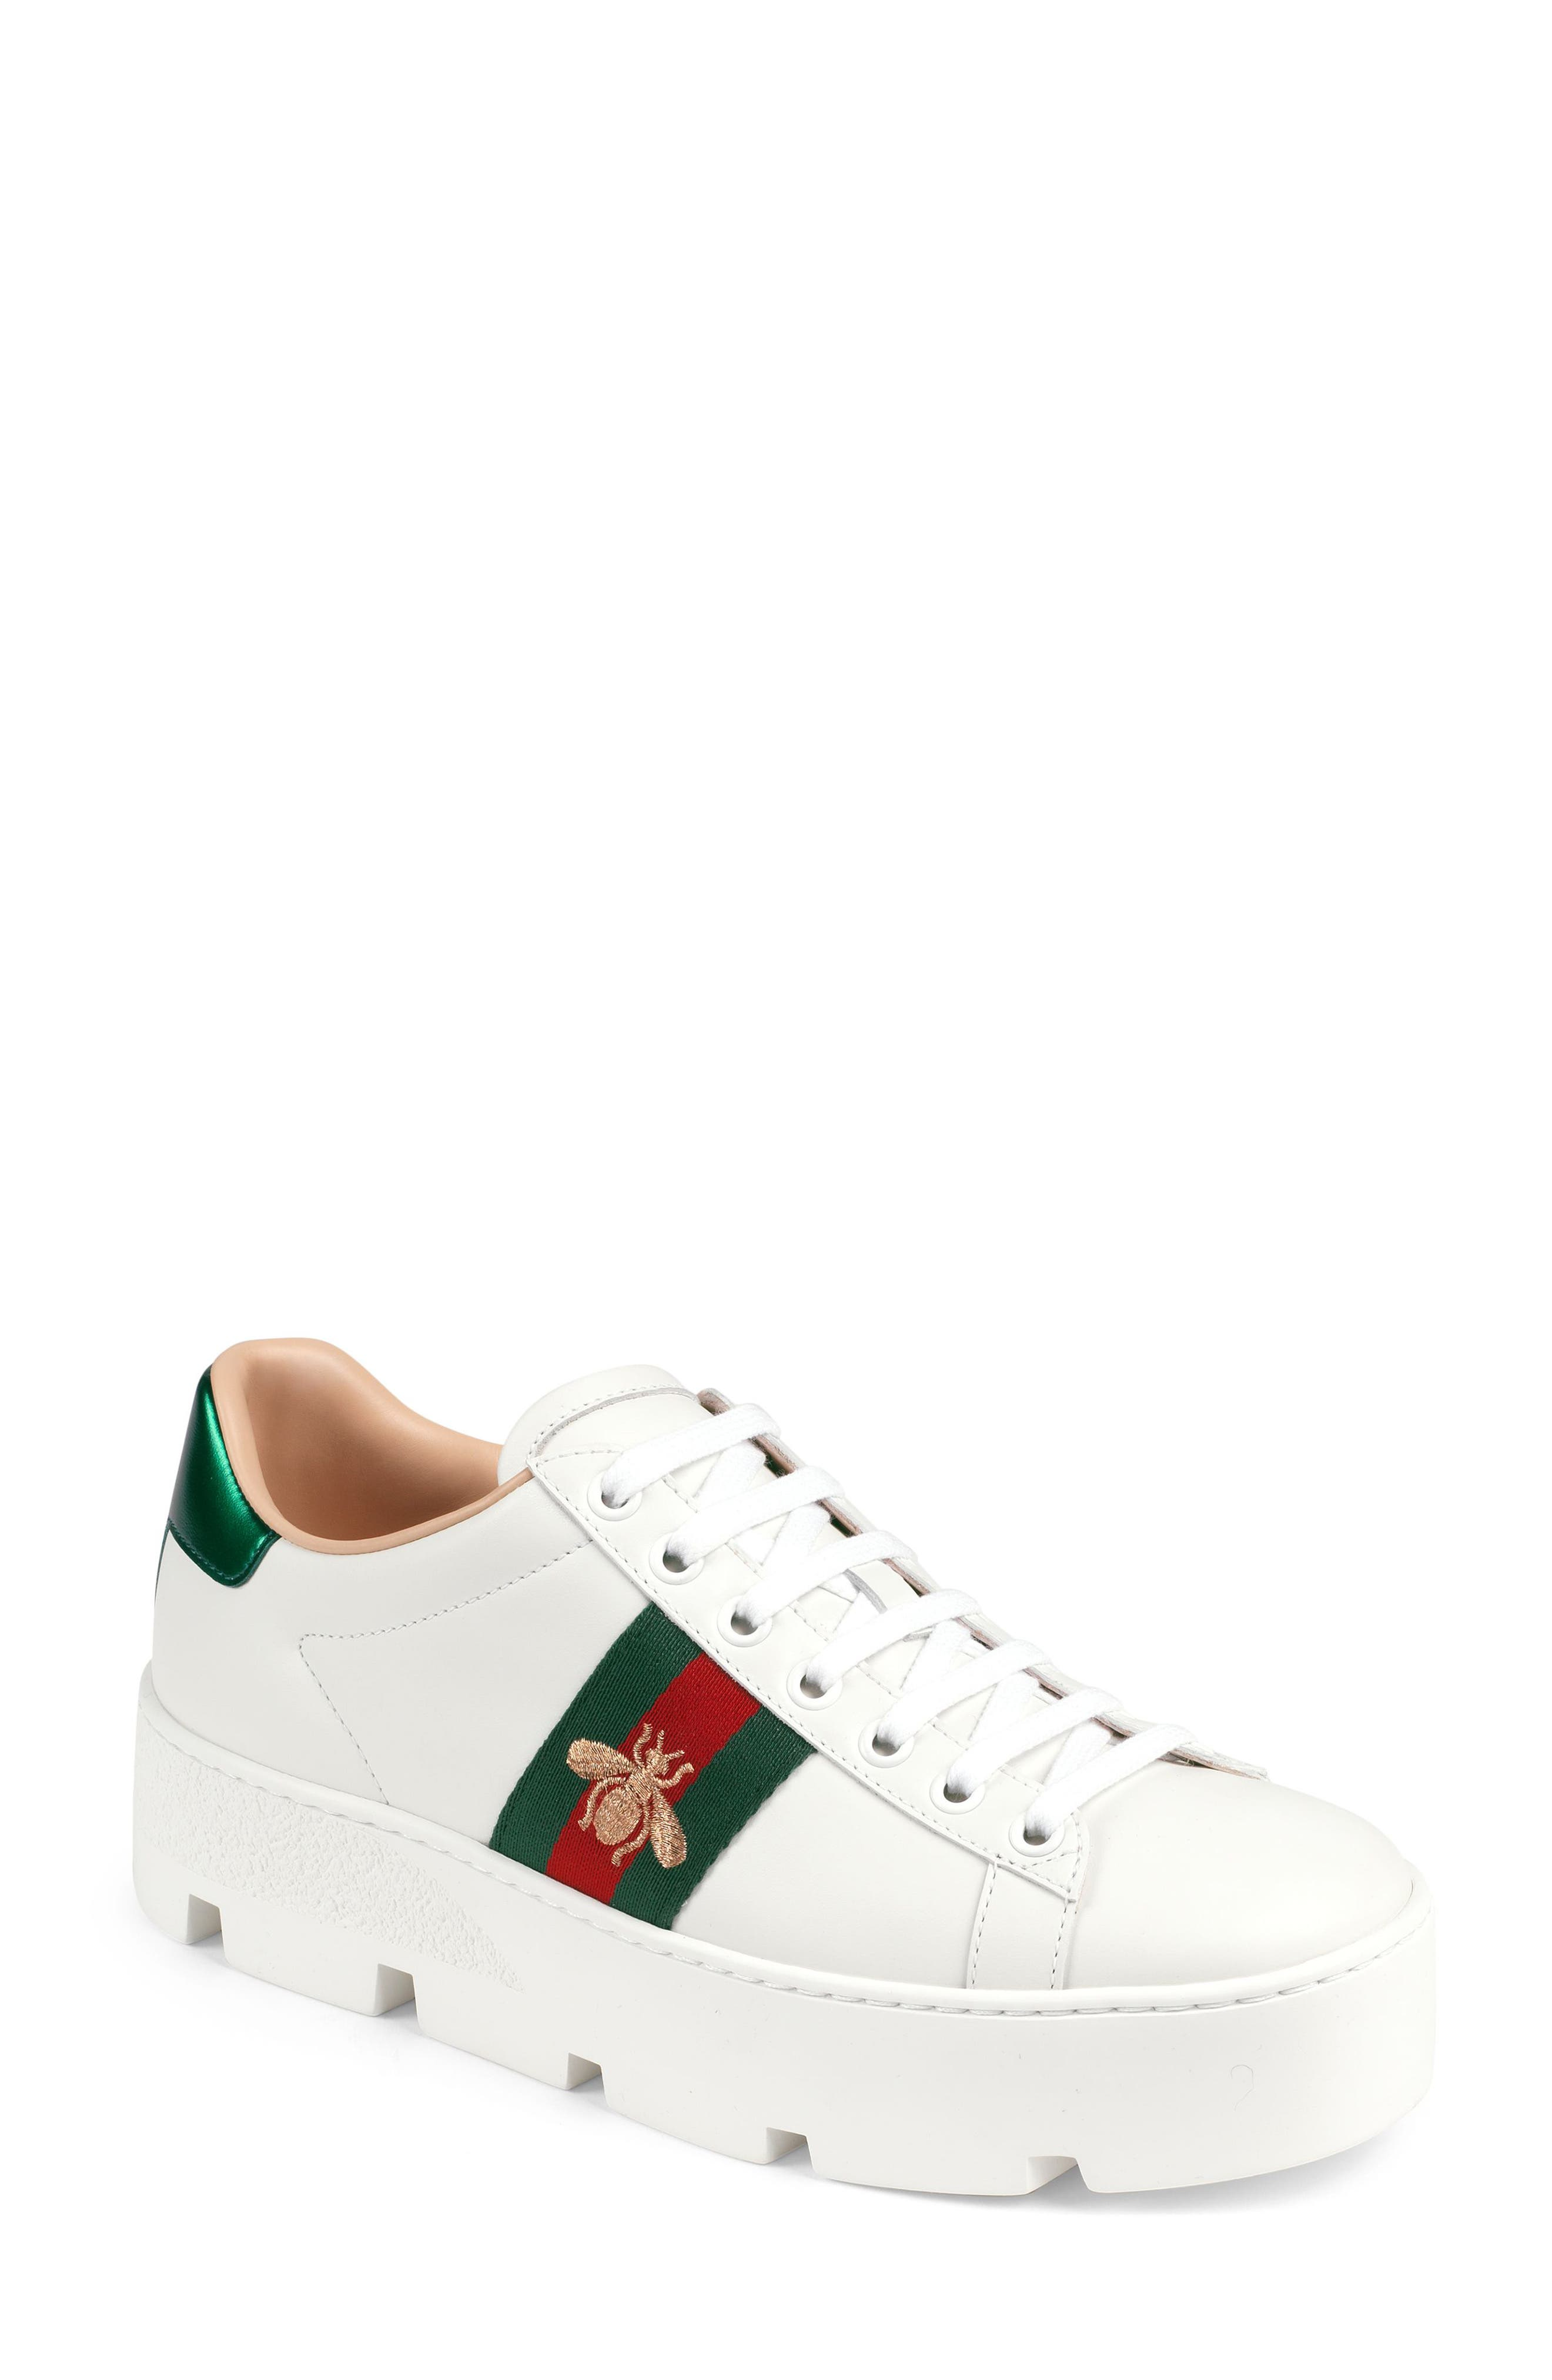 Gucci New Ace Platform Sneaker, White